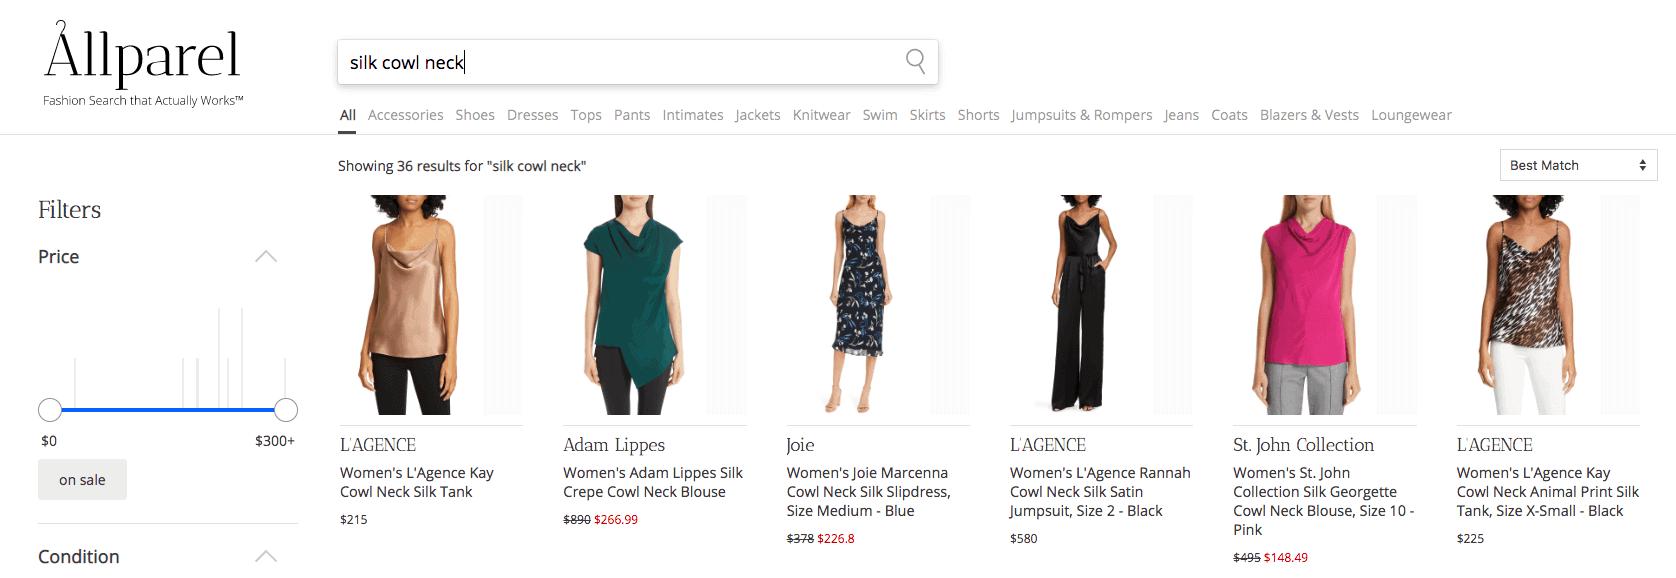 Allparel Product Search